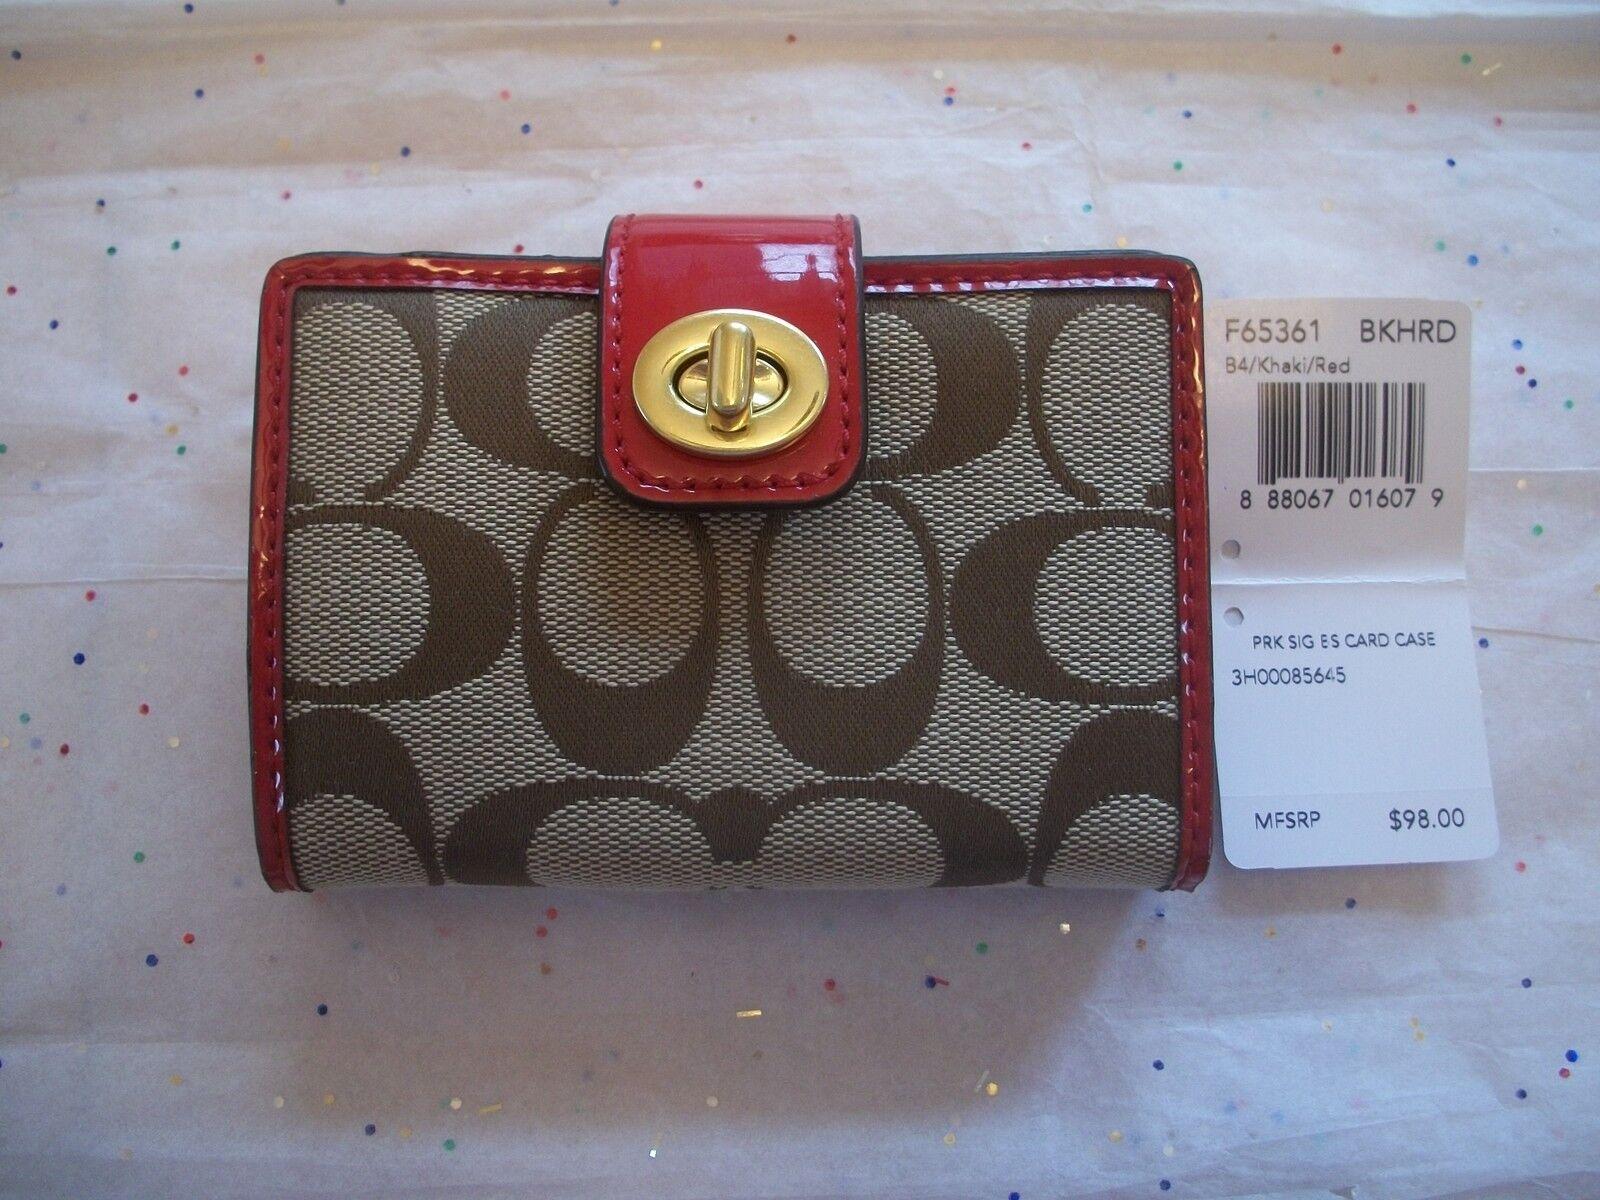 COACH PARK SIGNATURE RED KHAKI TURNLOCK CARD CASE 65361 NWT BEAUTIFUL!!